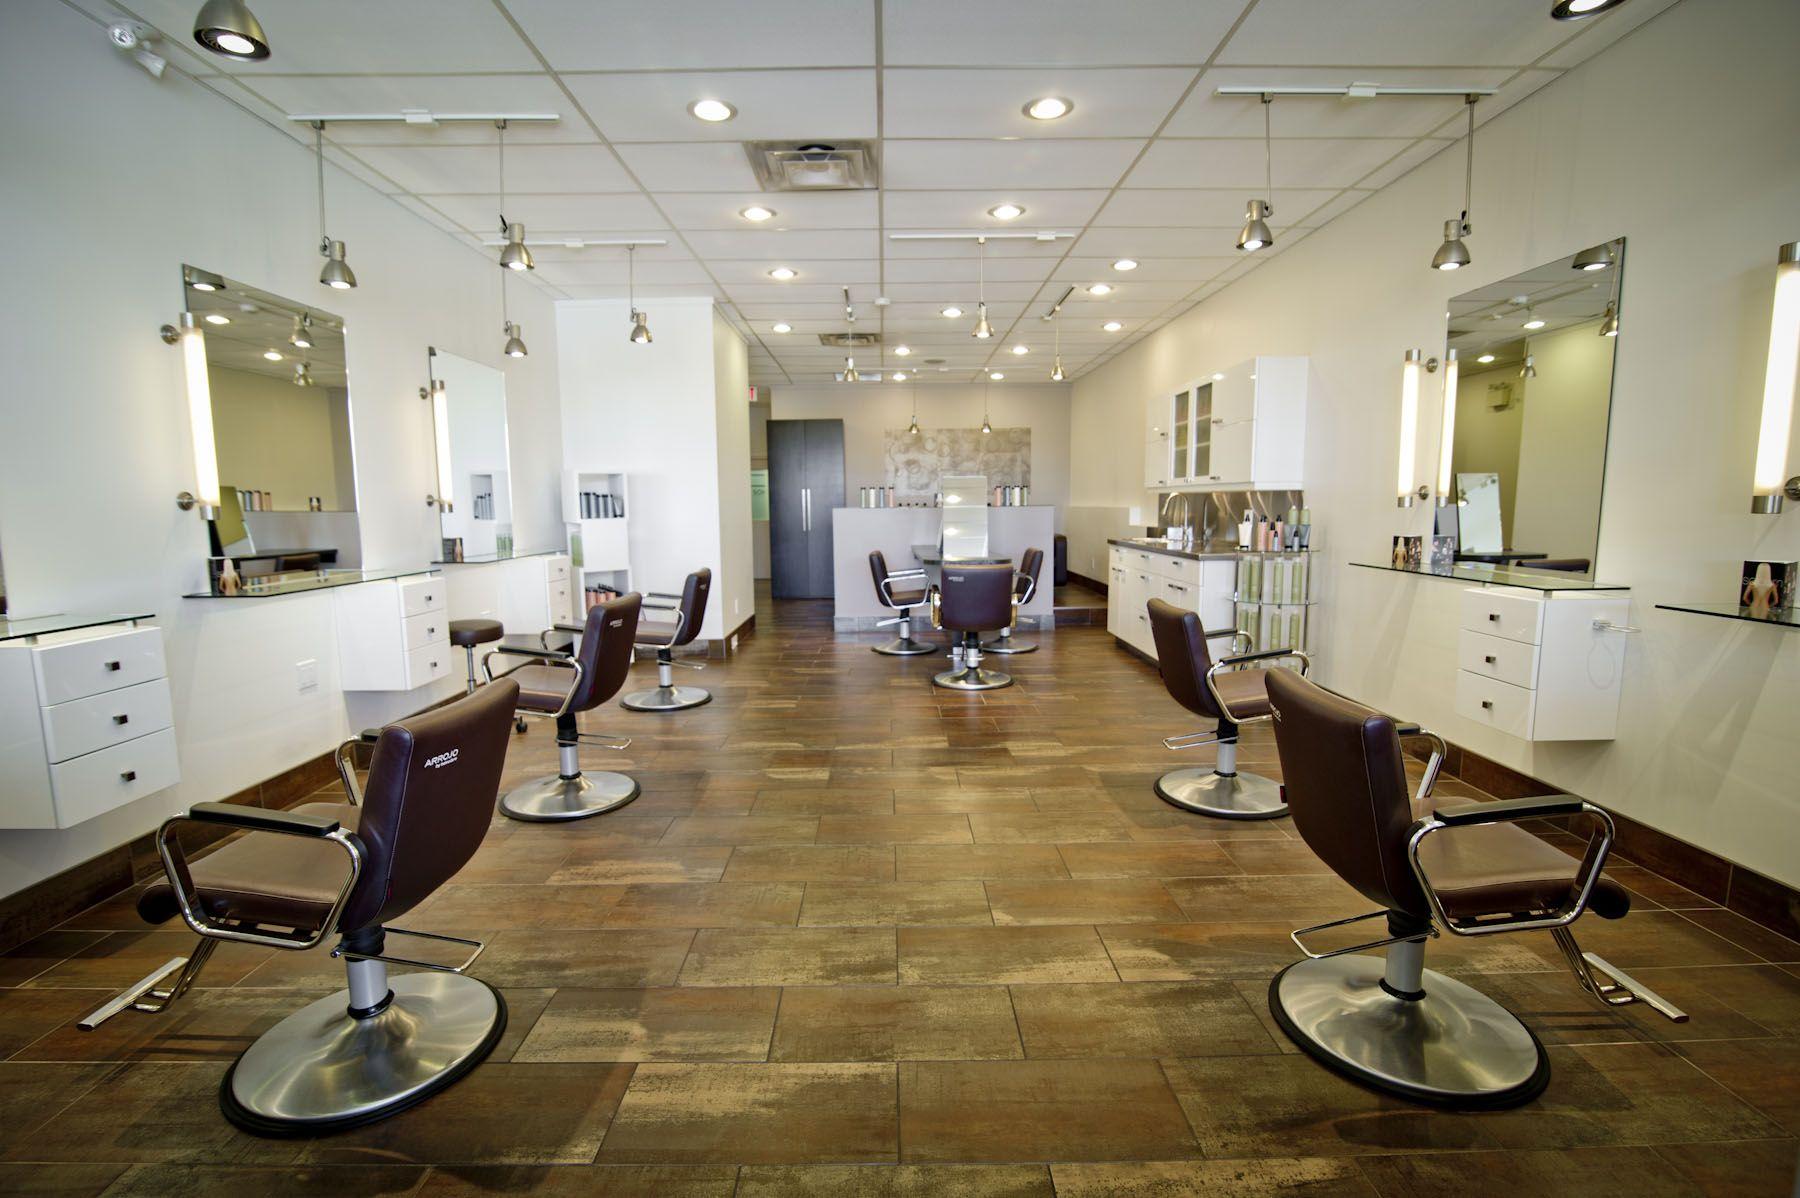 Nice 1200 X 1200 Floor Tiles Huge 1200 X 600 Floor Tiles Clean 2 X 4 Ceiling Tiles 2 X4 Ceiling Tiles Young 3 X 6 Marble Subway Tile Fresh3 X 6 Subway Tile SOHO Hair \u2022\u2022 Edmonton Salon Details | Salon Ideas | Pinterest ..